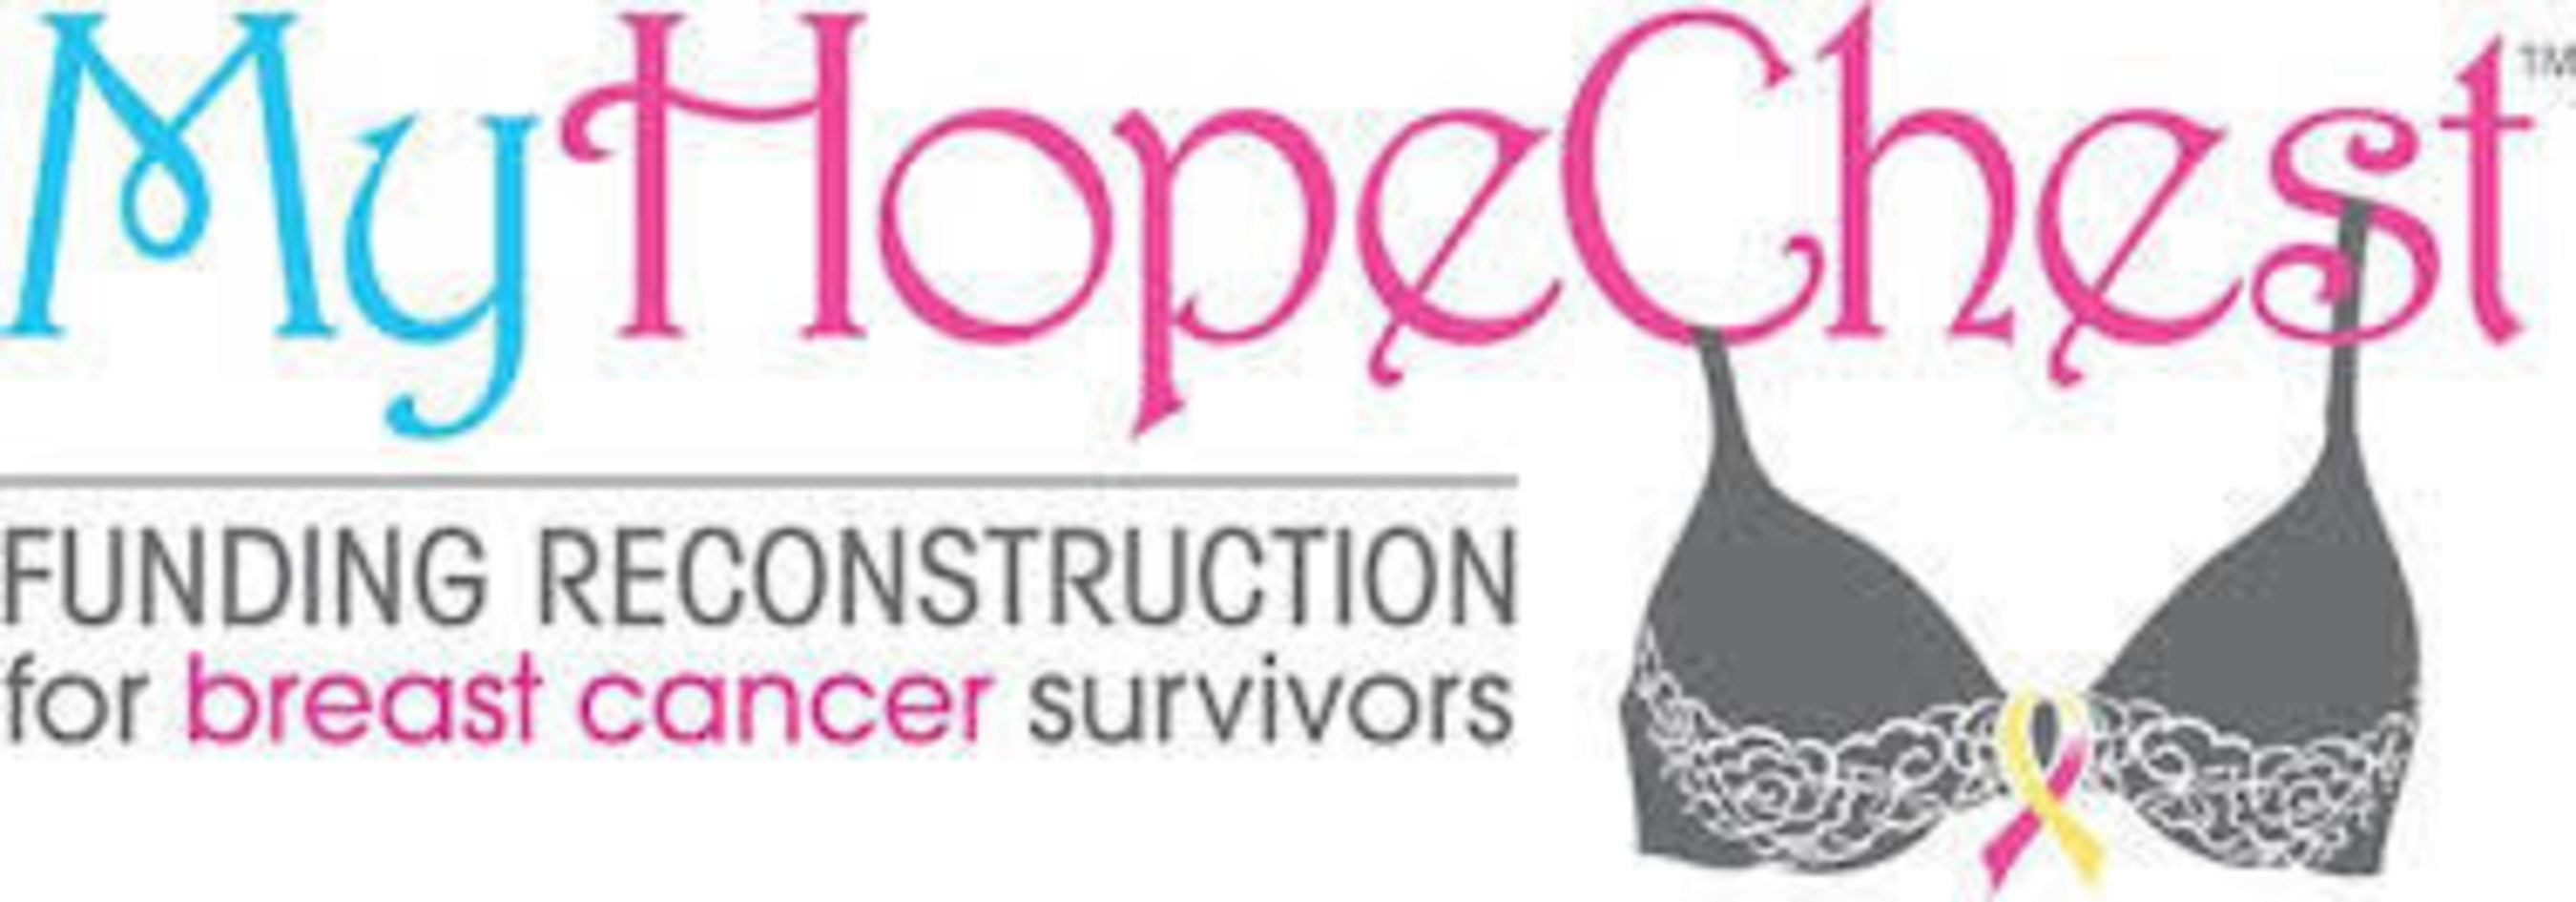 Breast Cancer Survivor Gets a Holiday